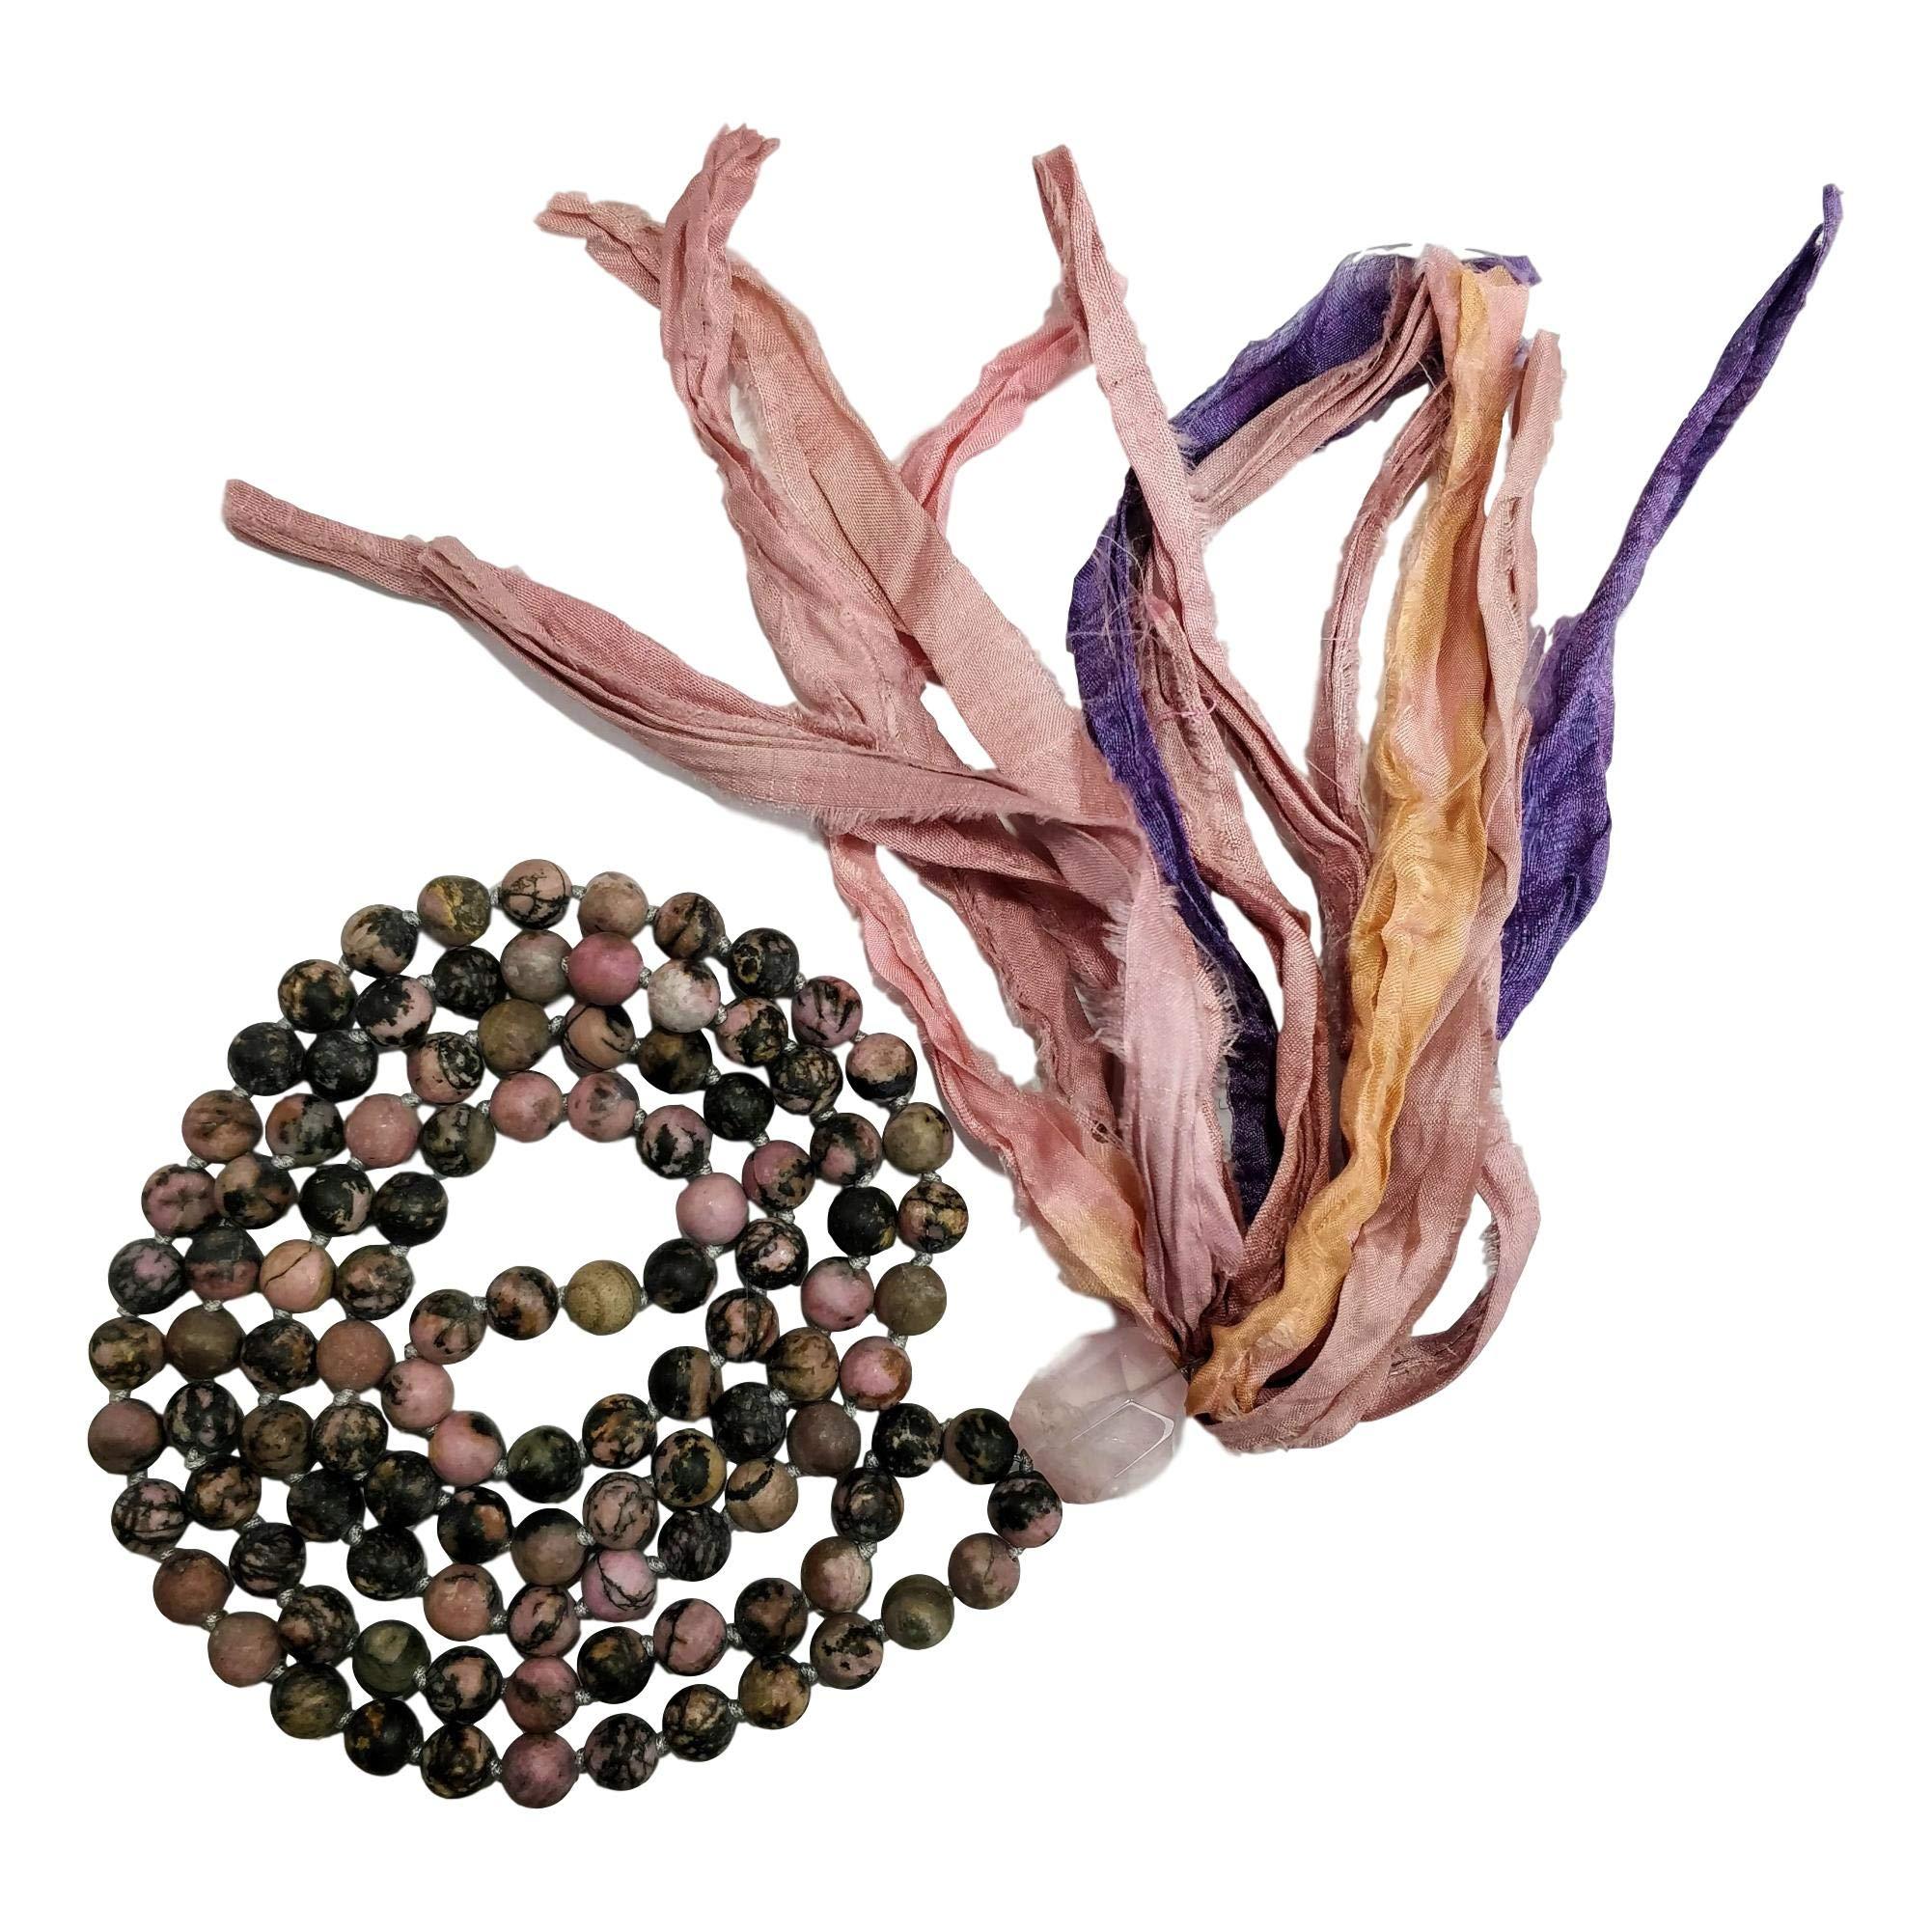 Live Radiantly 108 Mala Bead Necklace - 8mm Matte Rhodonite Stones - Rose Quartz Guru Bead - Sari Silk Tassel - Meditation, Mindfulness, Yoga - Mala to Foster Forgiveness, Healing and Love